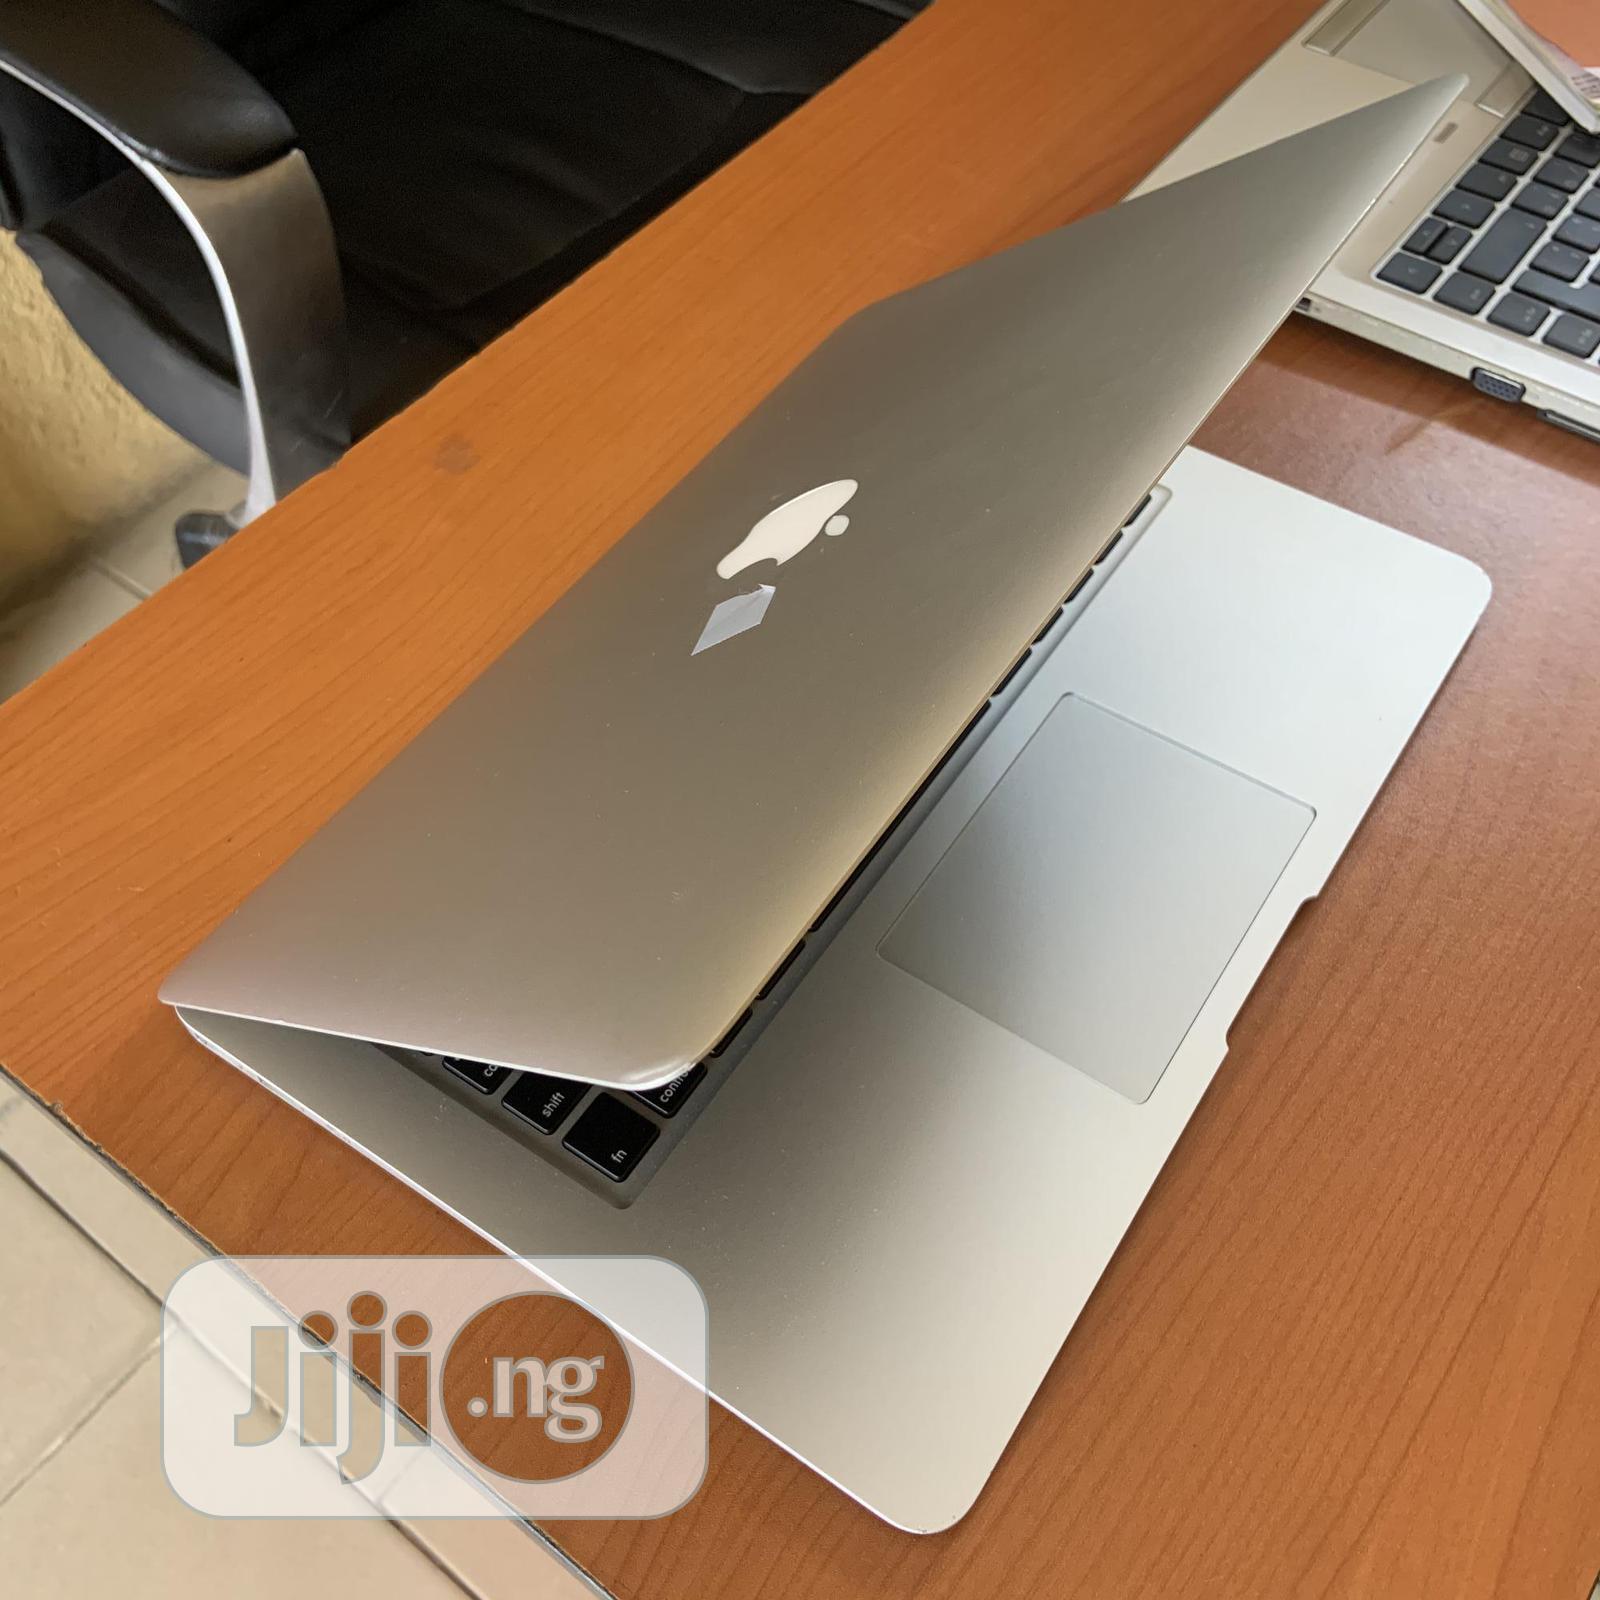 Laptop Apple MacBook Air 2015 8GB Intel Core I7 SSD 256GB